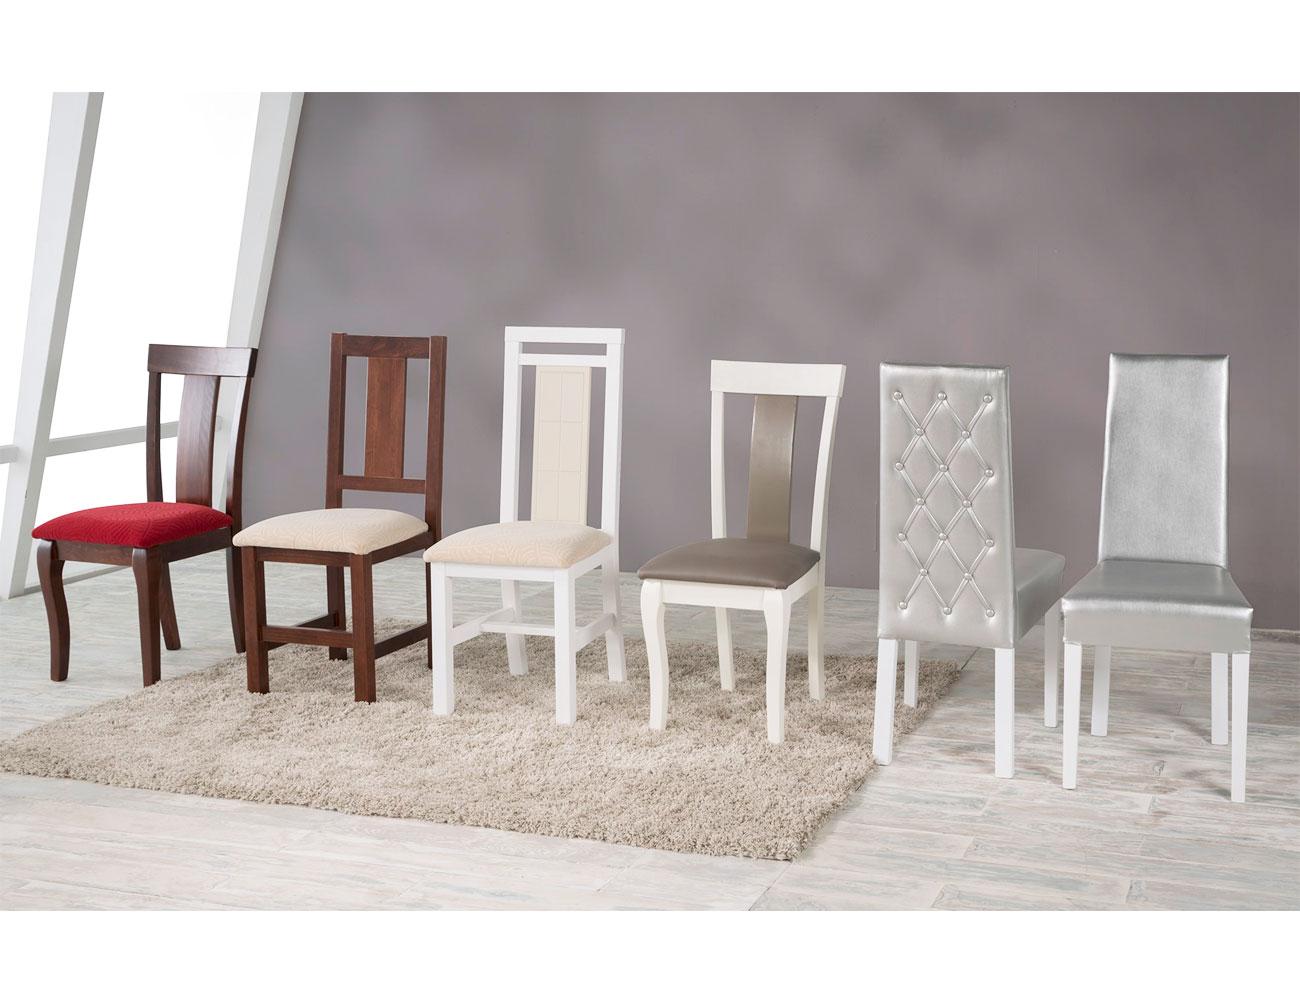 Modelos sillas1